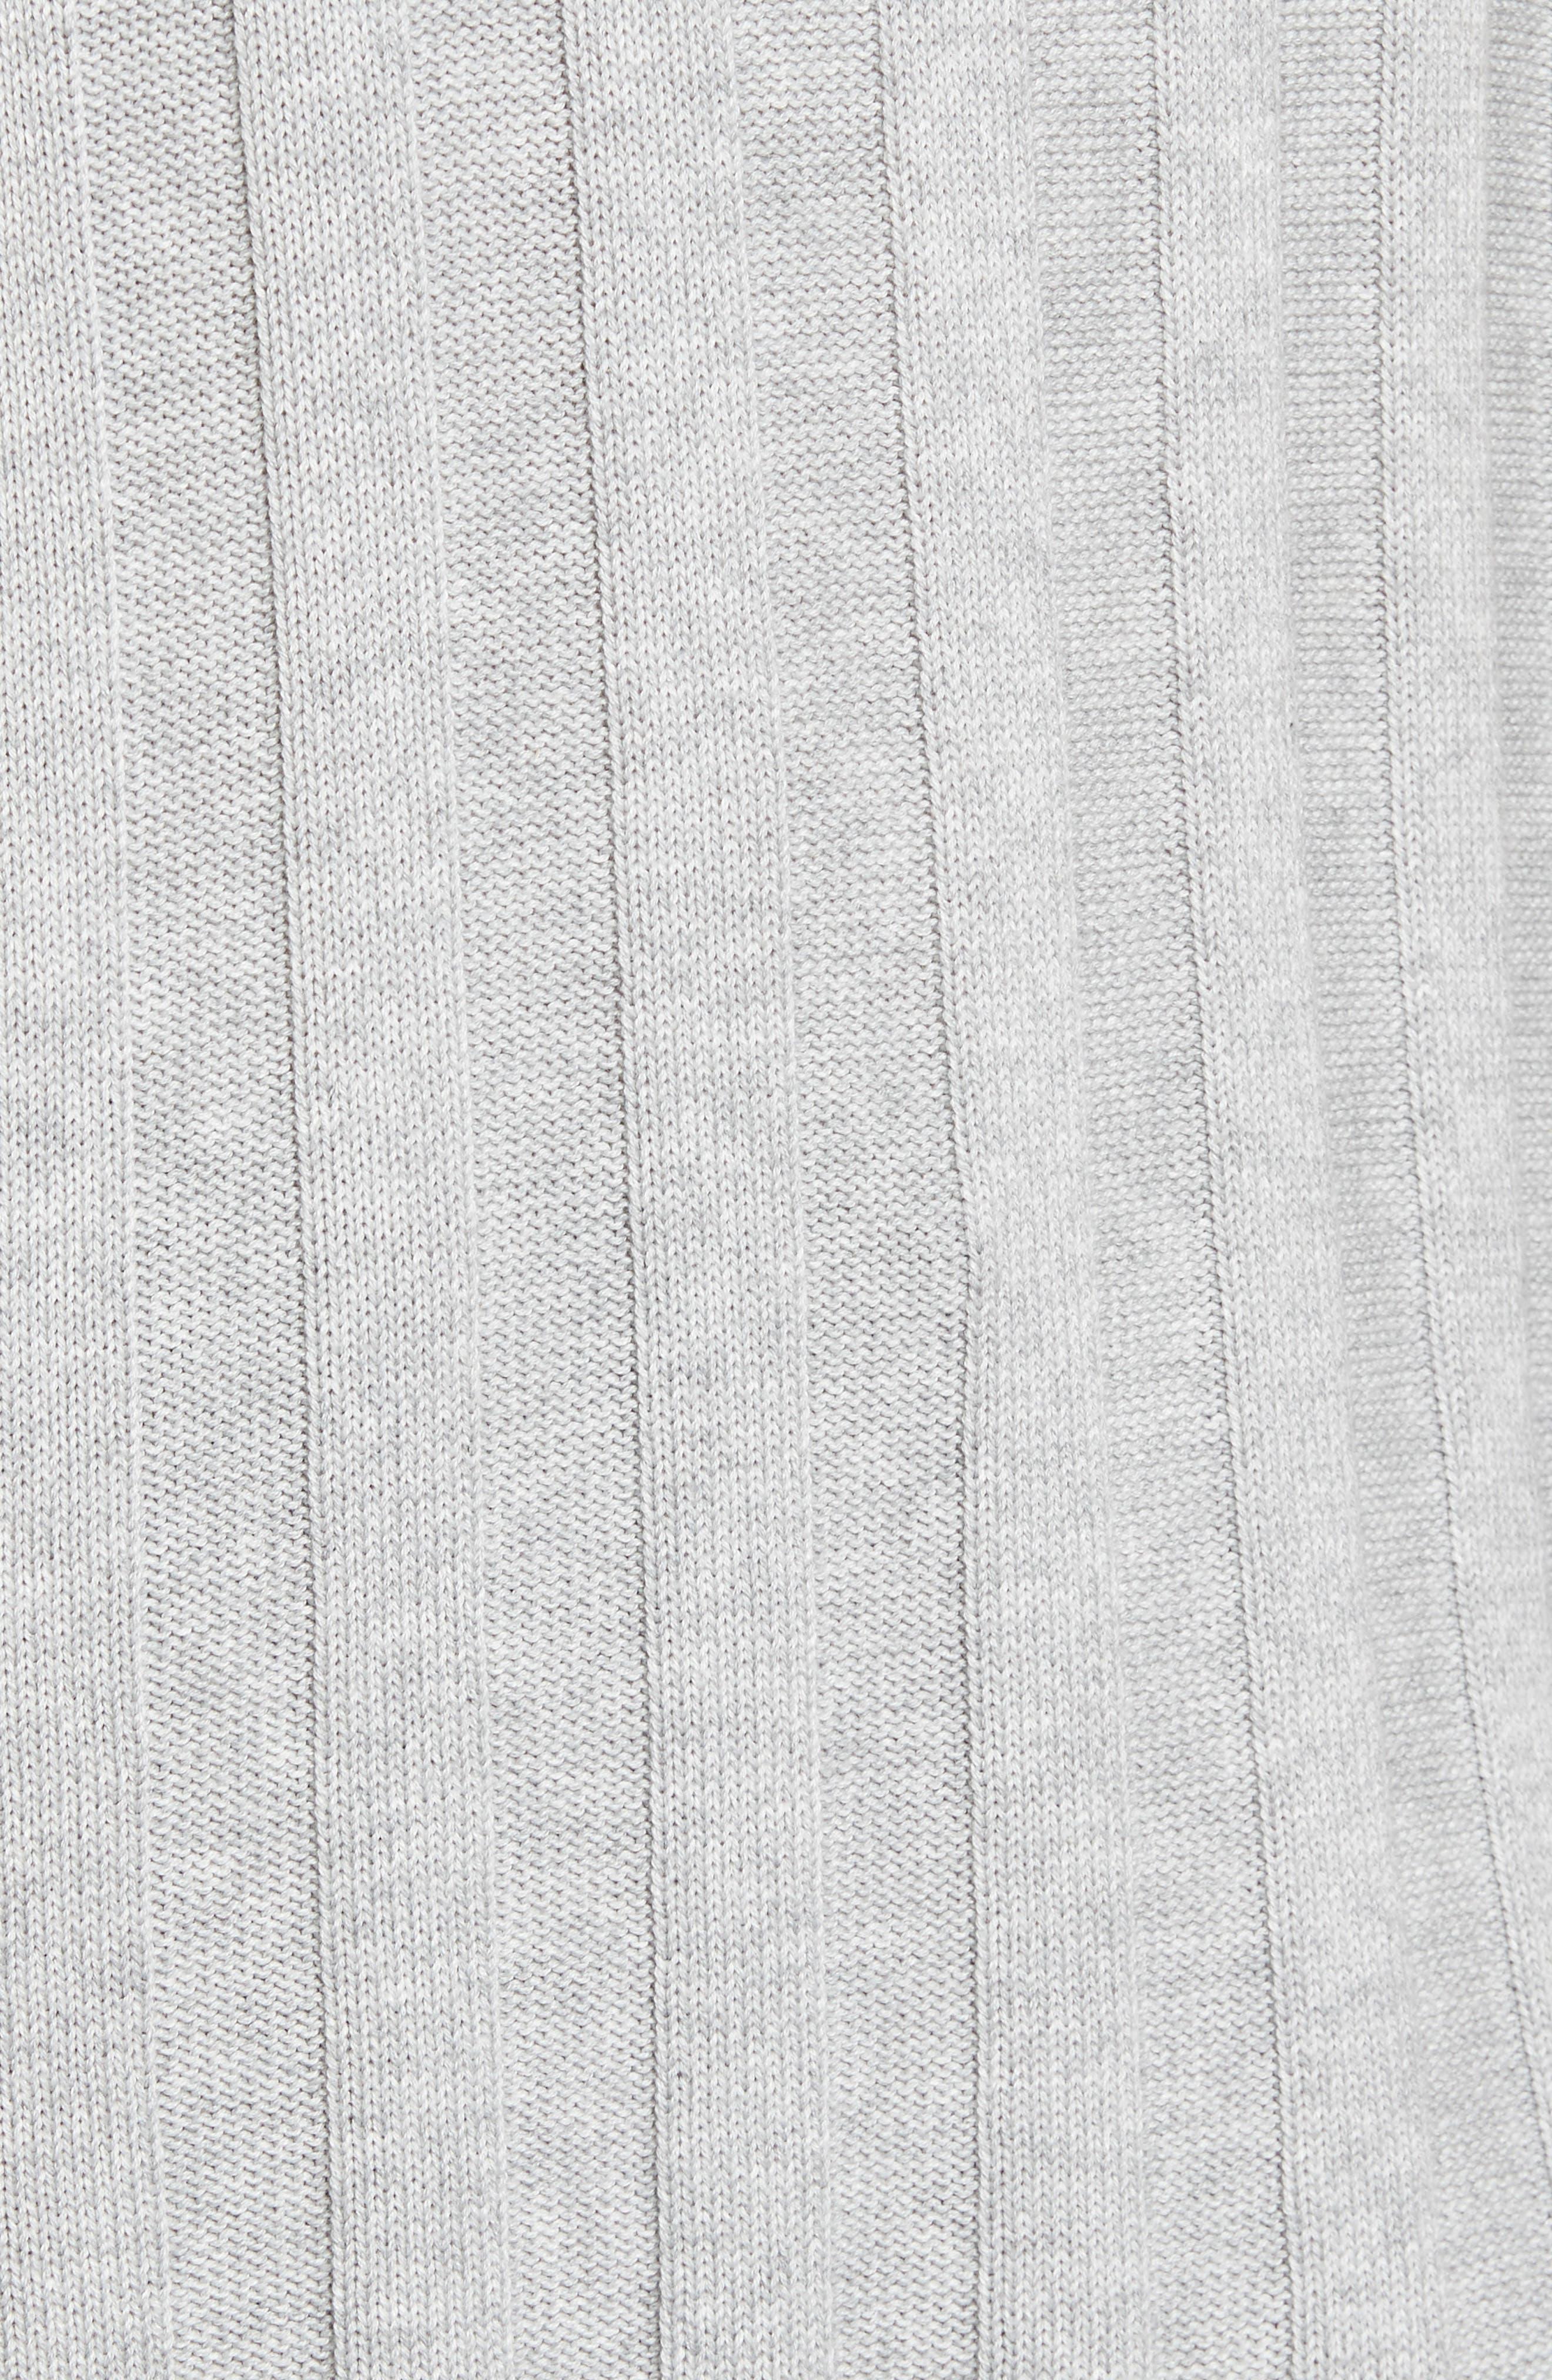 Fringe Cowl Neck Sweater,                             Alternate thumbnail 14, color,